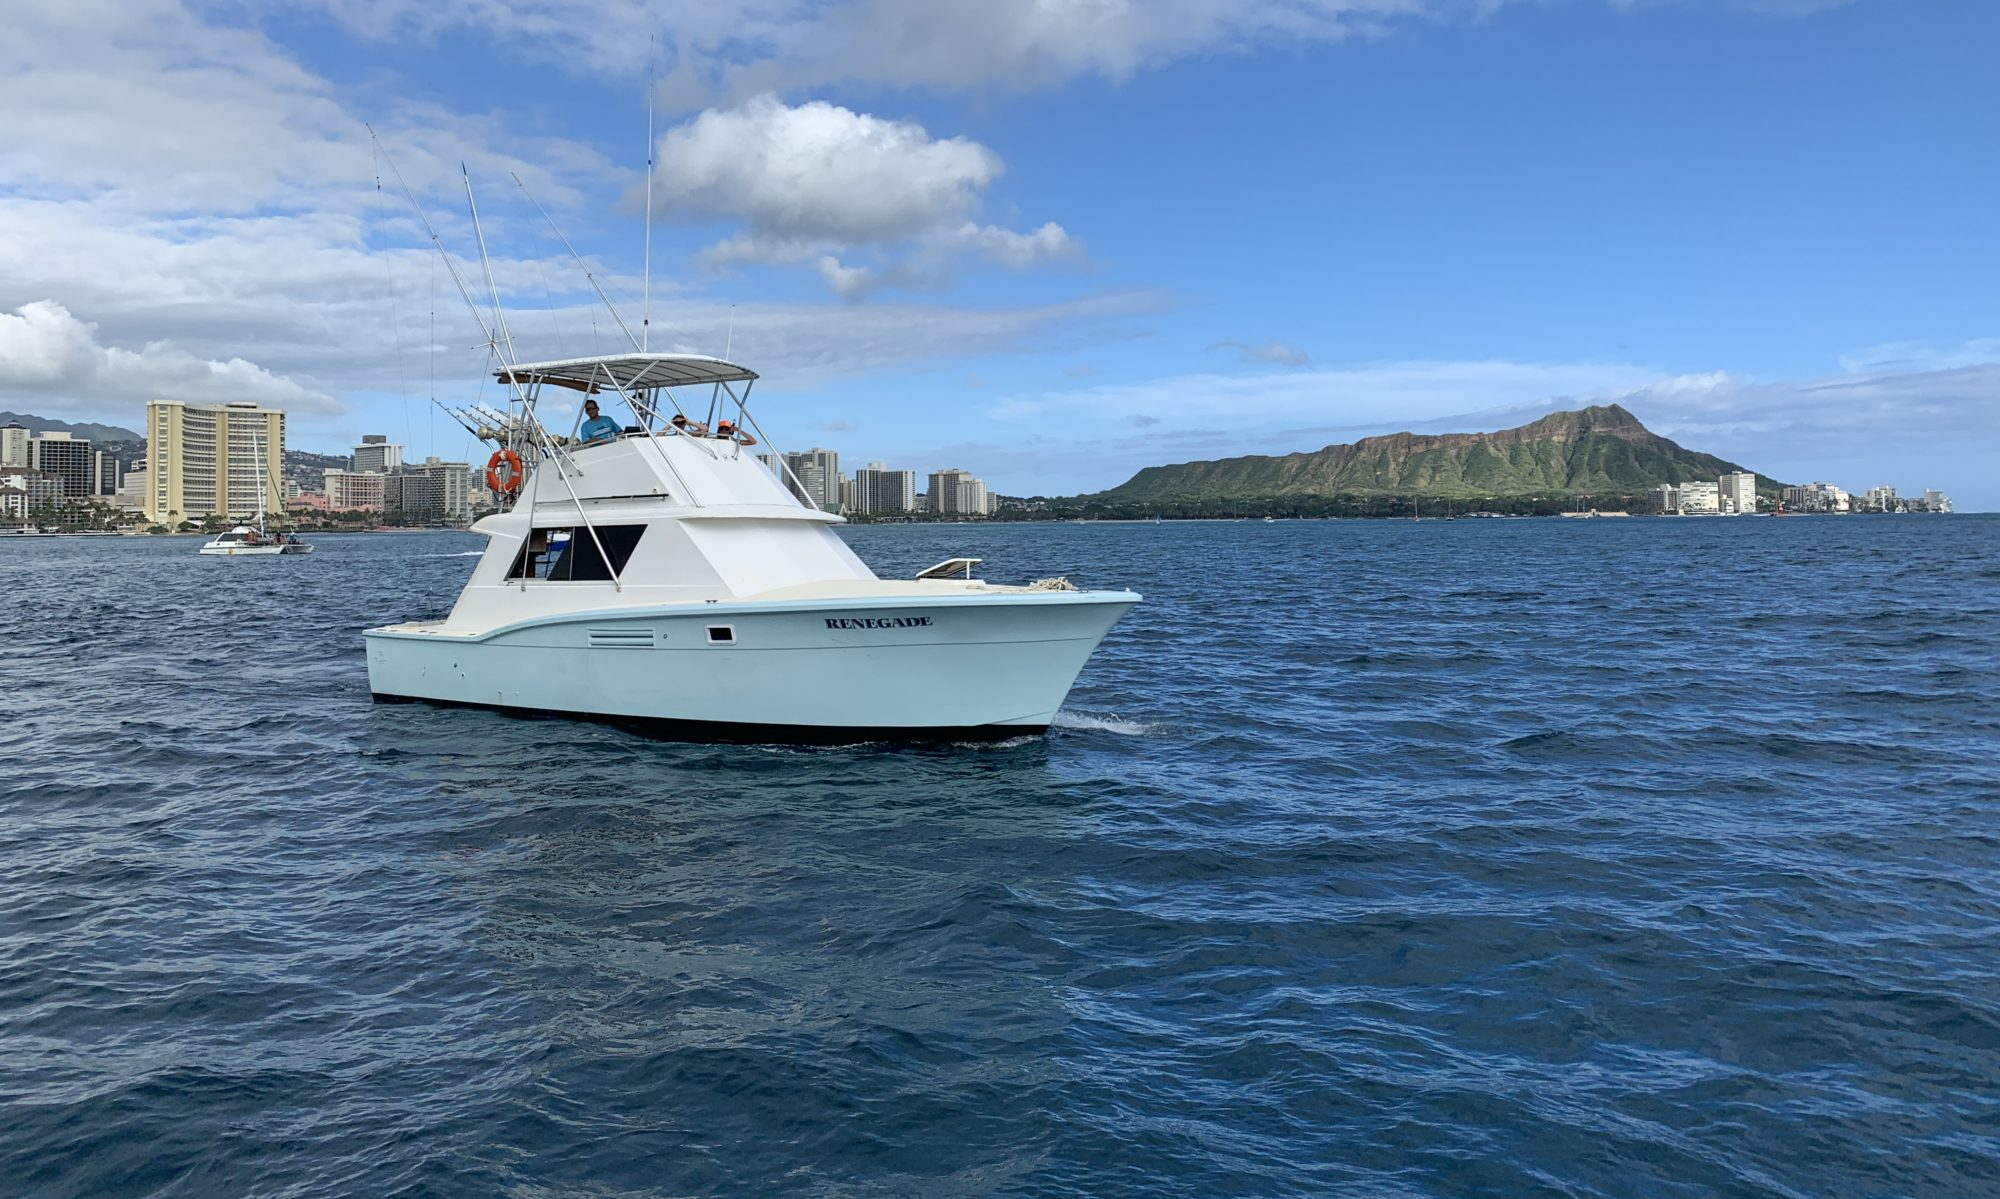 Waikiki Sport Fishing